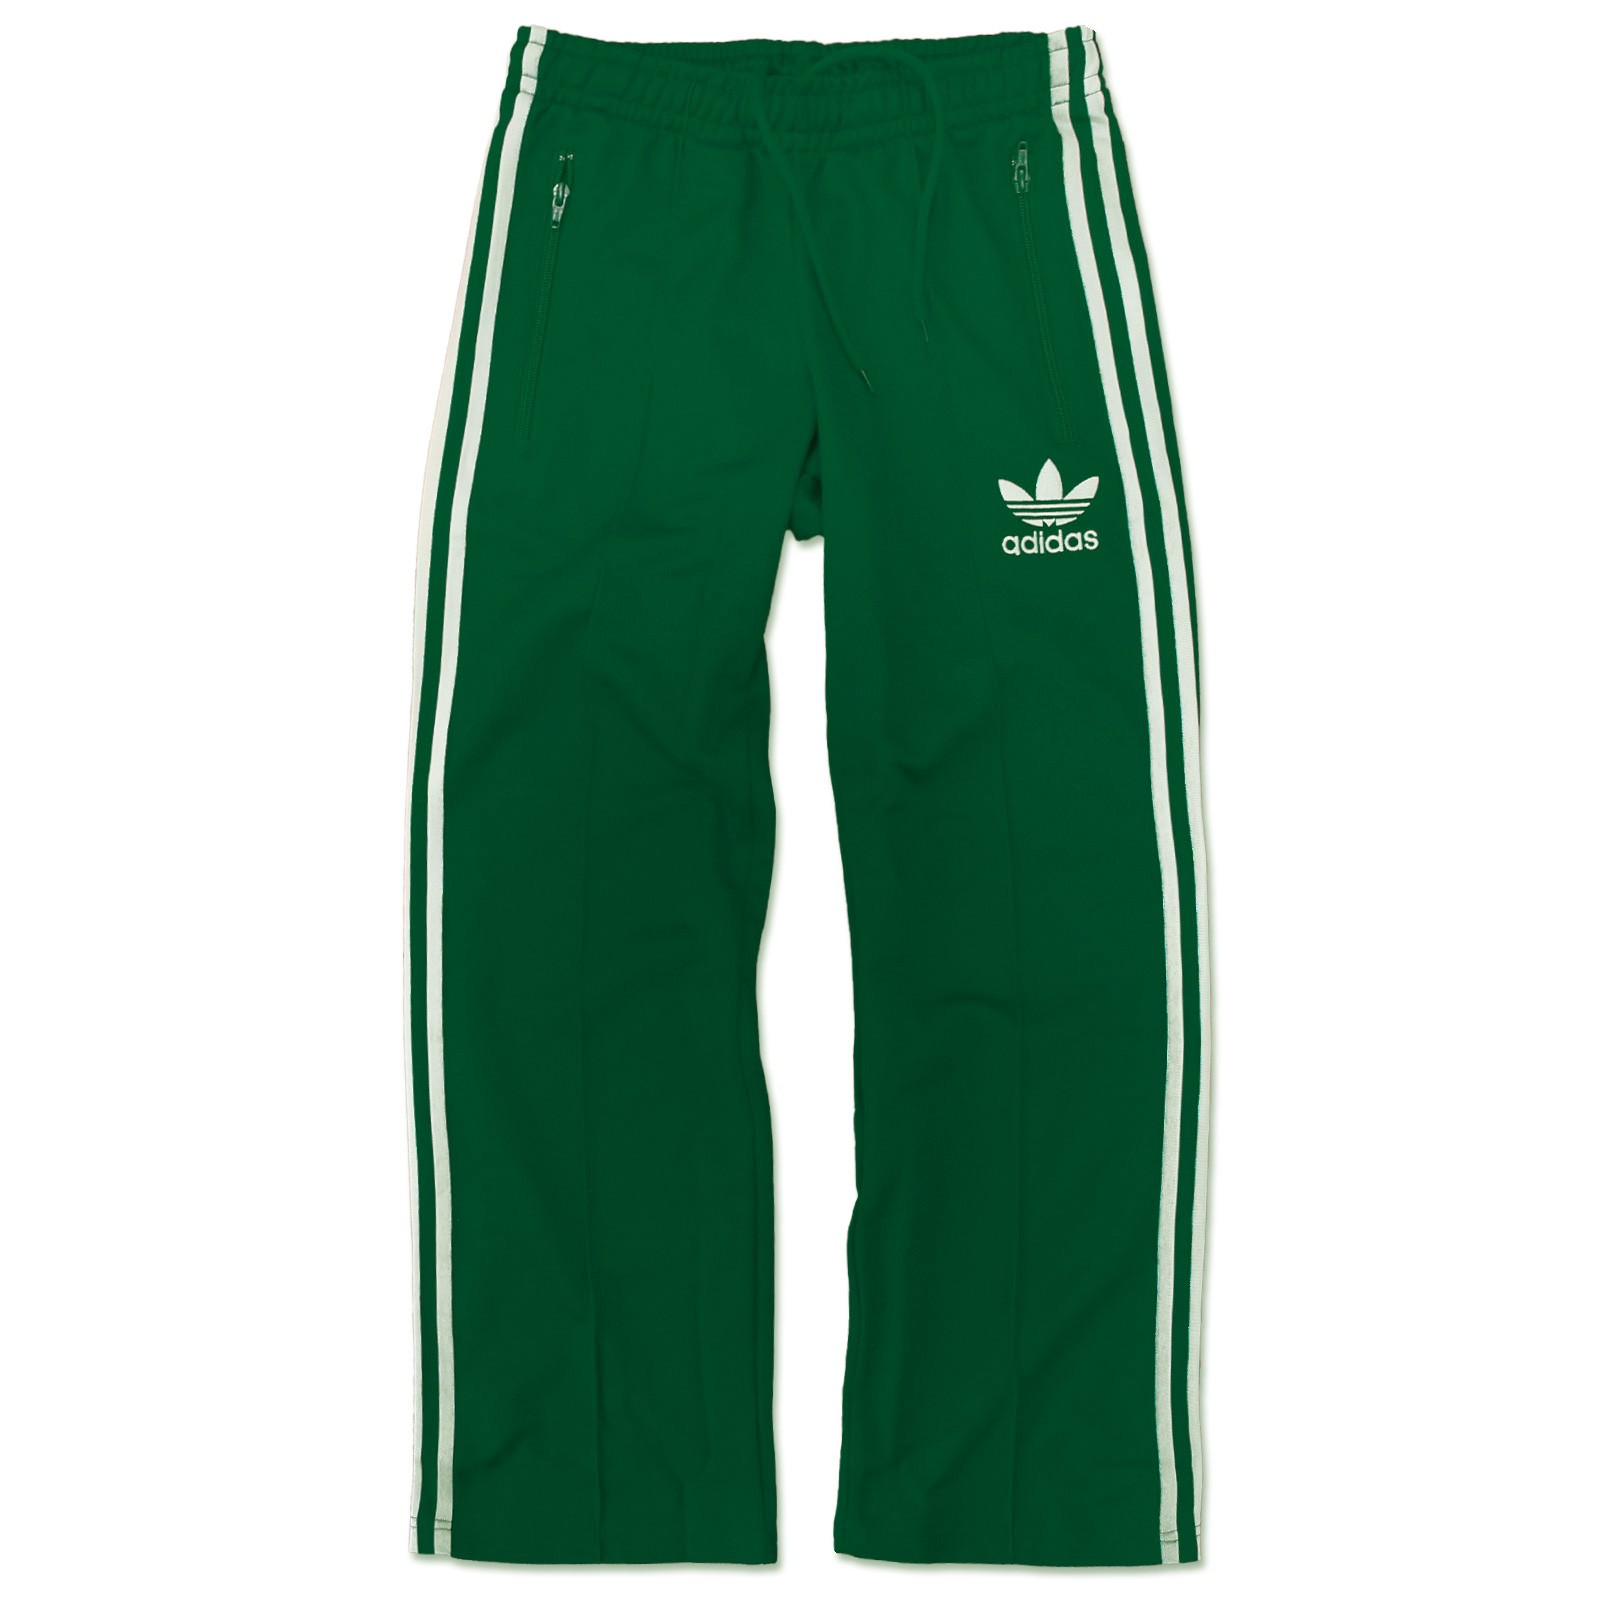 Details about Adidas Originals Europa Tp Beckenbauer Training Pants Sport Pants Green White show original title